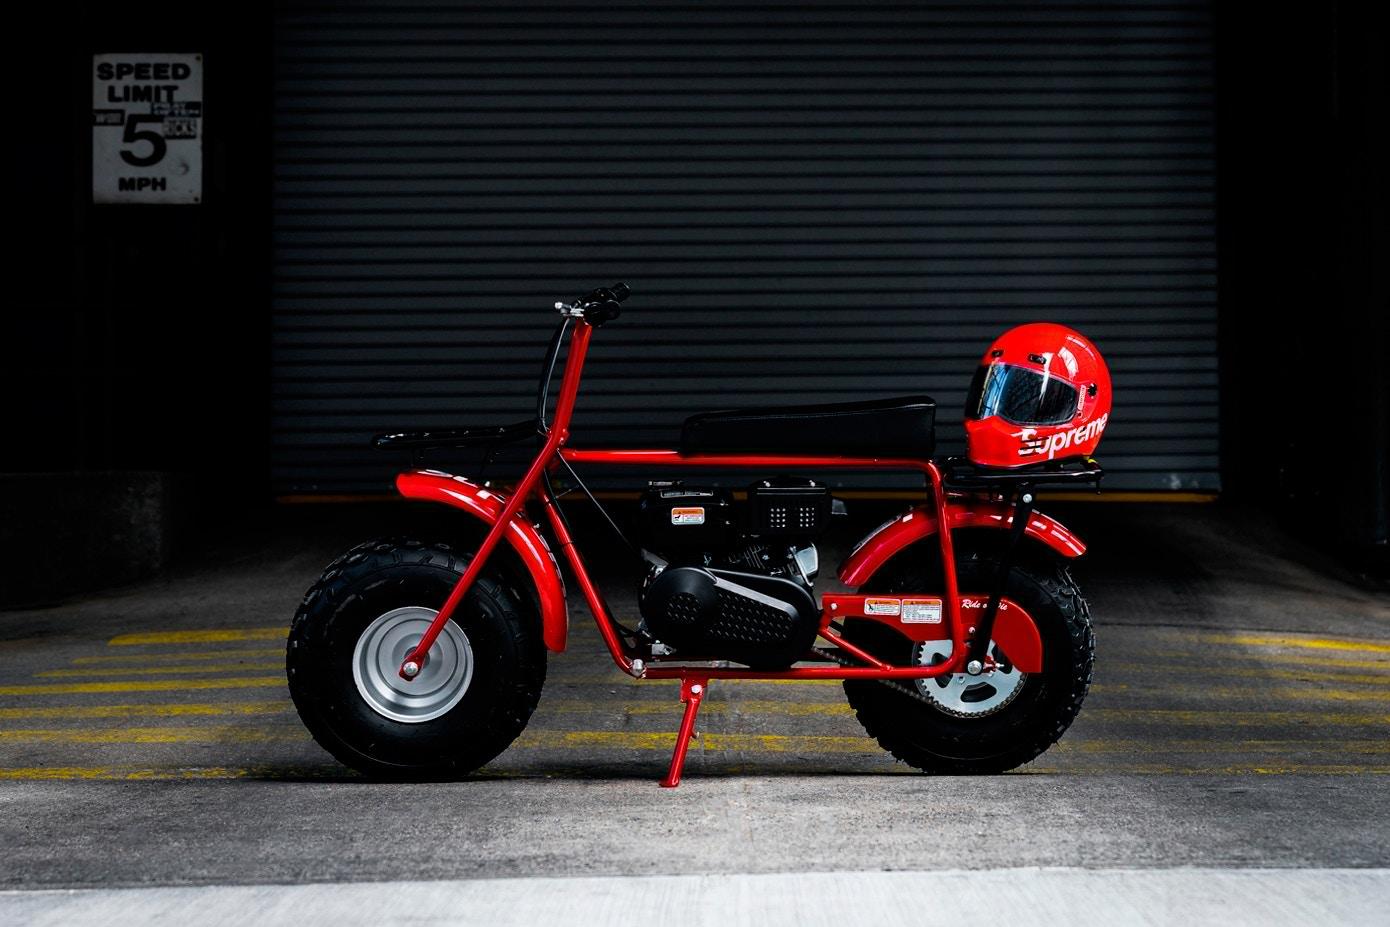 supreme coleman ct200u minibike 01 - Supreme lança oficialmente minimoto com a Coleman